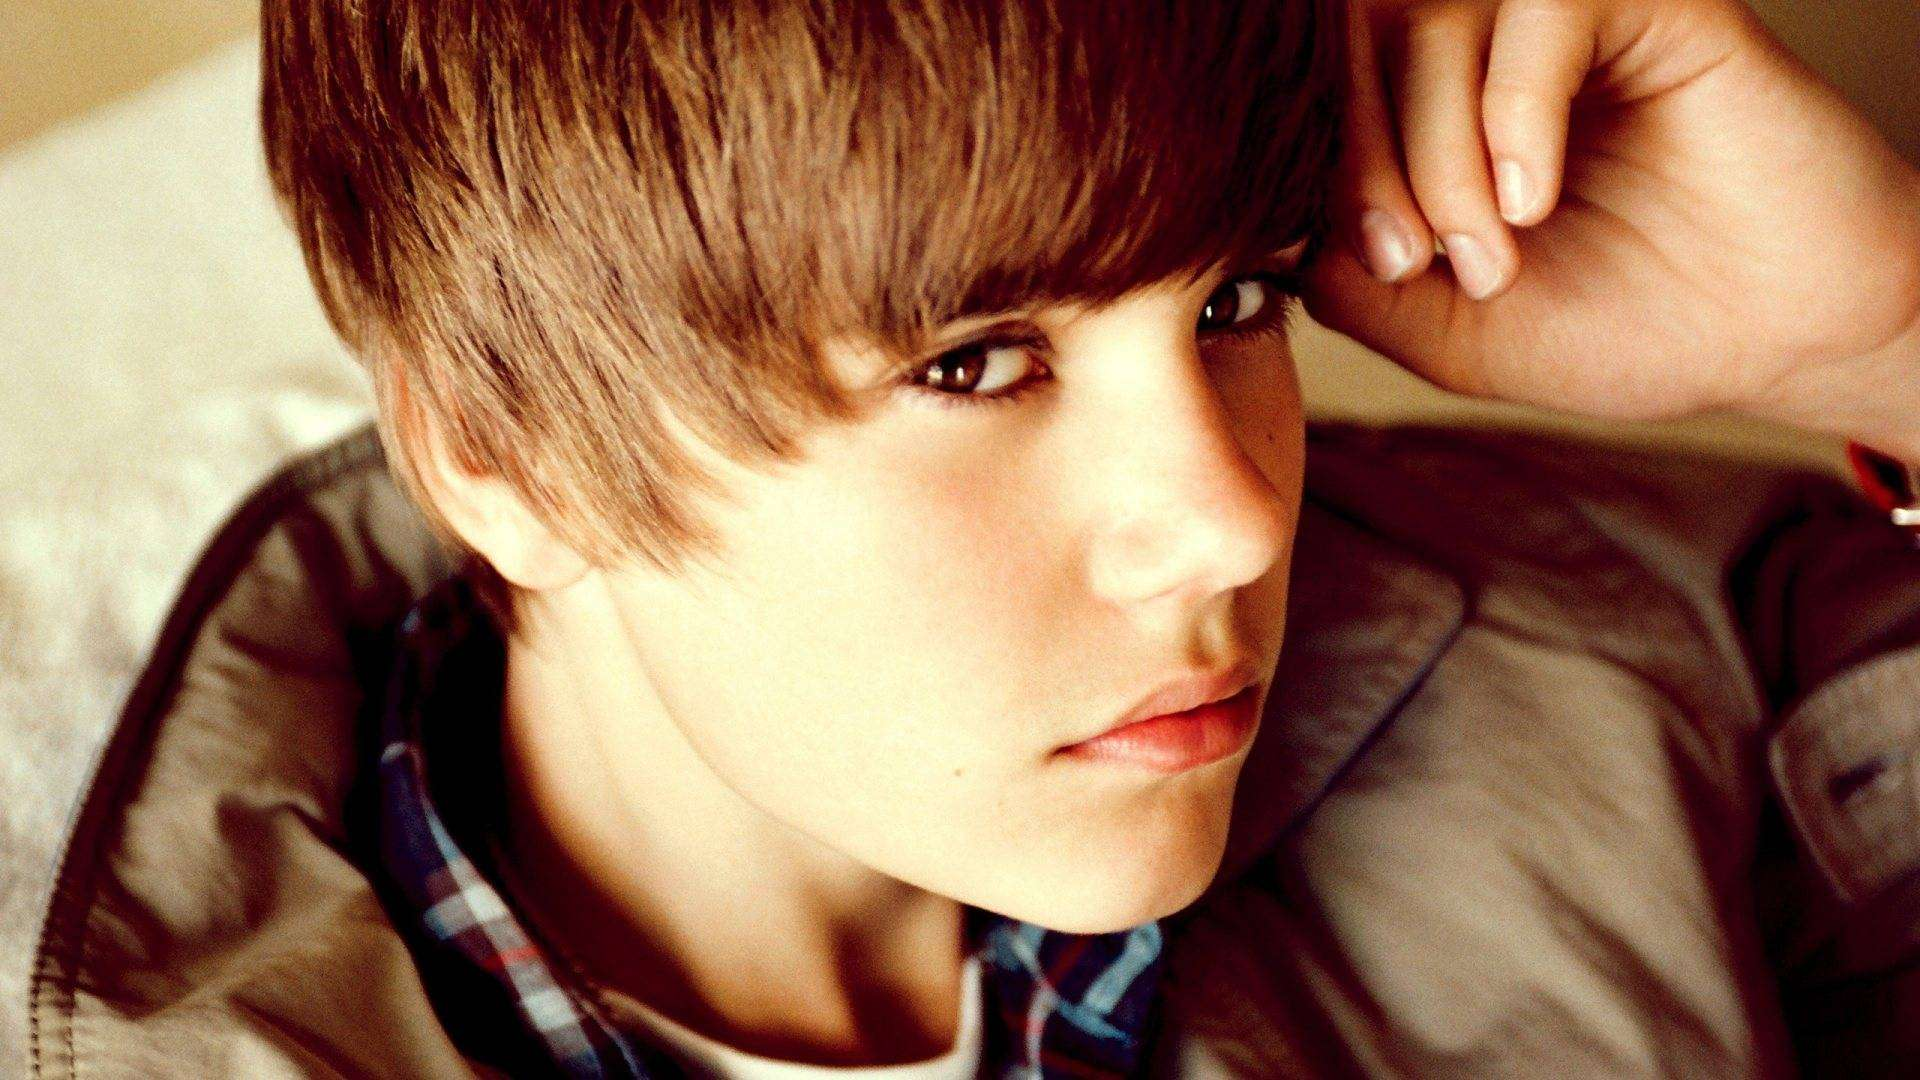 Wallpaper download justin bieber - Justin Bieber Wallpaper Justin Bieber Pictures Best Collection Download